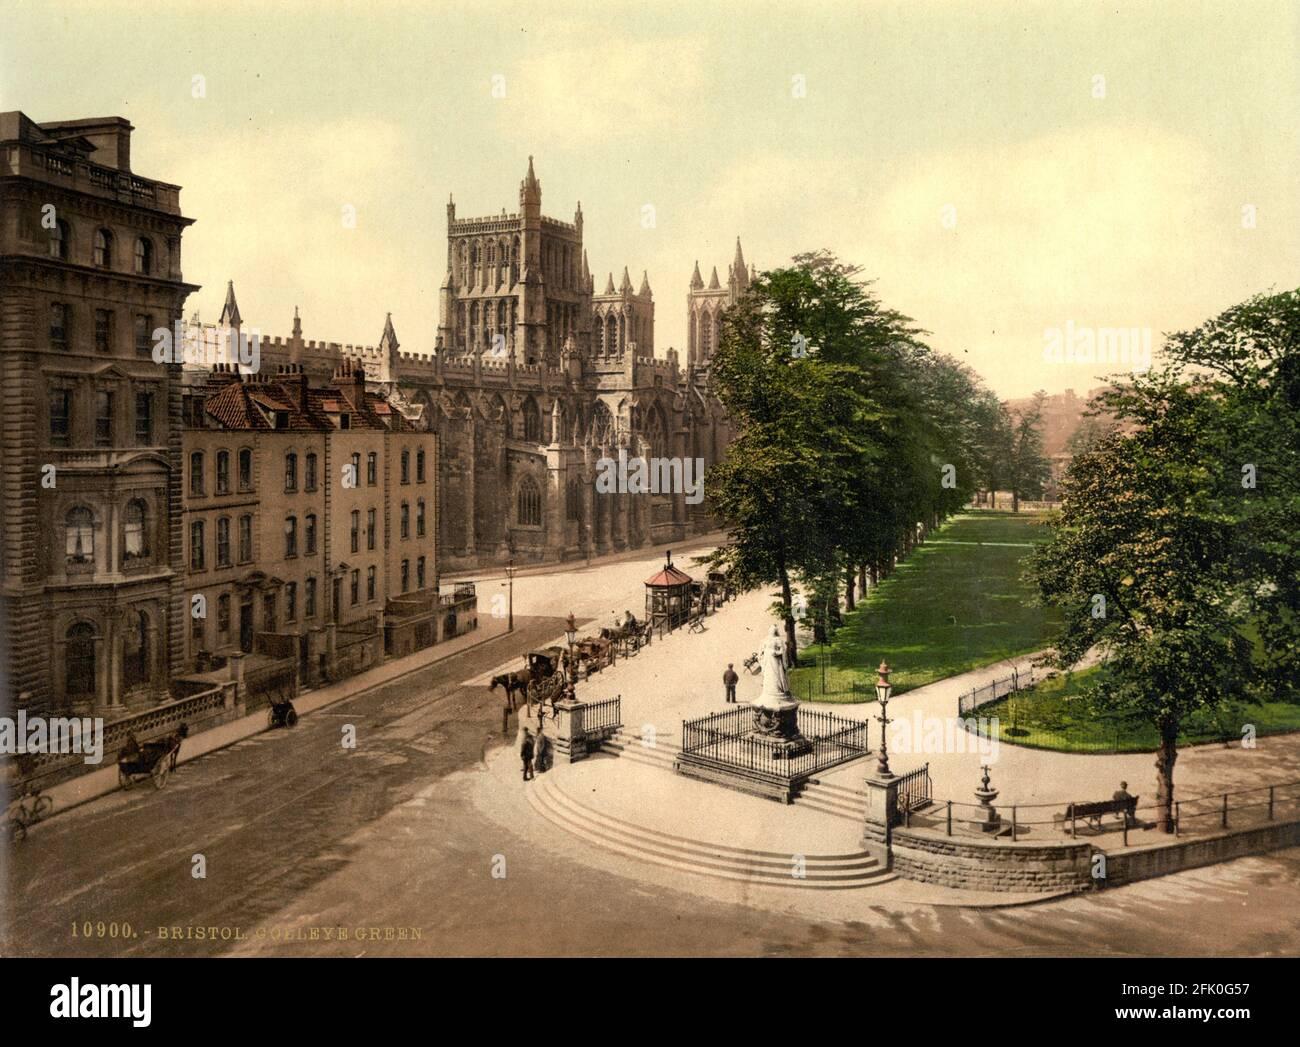 College Green, Bristol vers 1890-1900 Banque D'Images